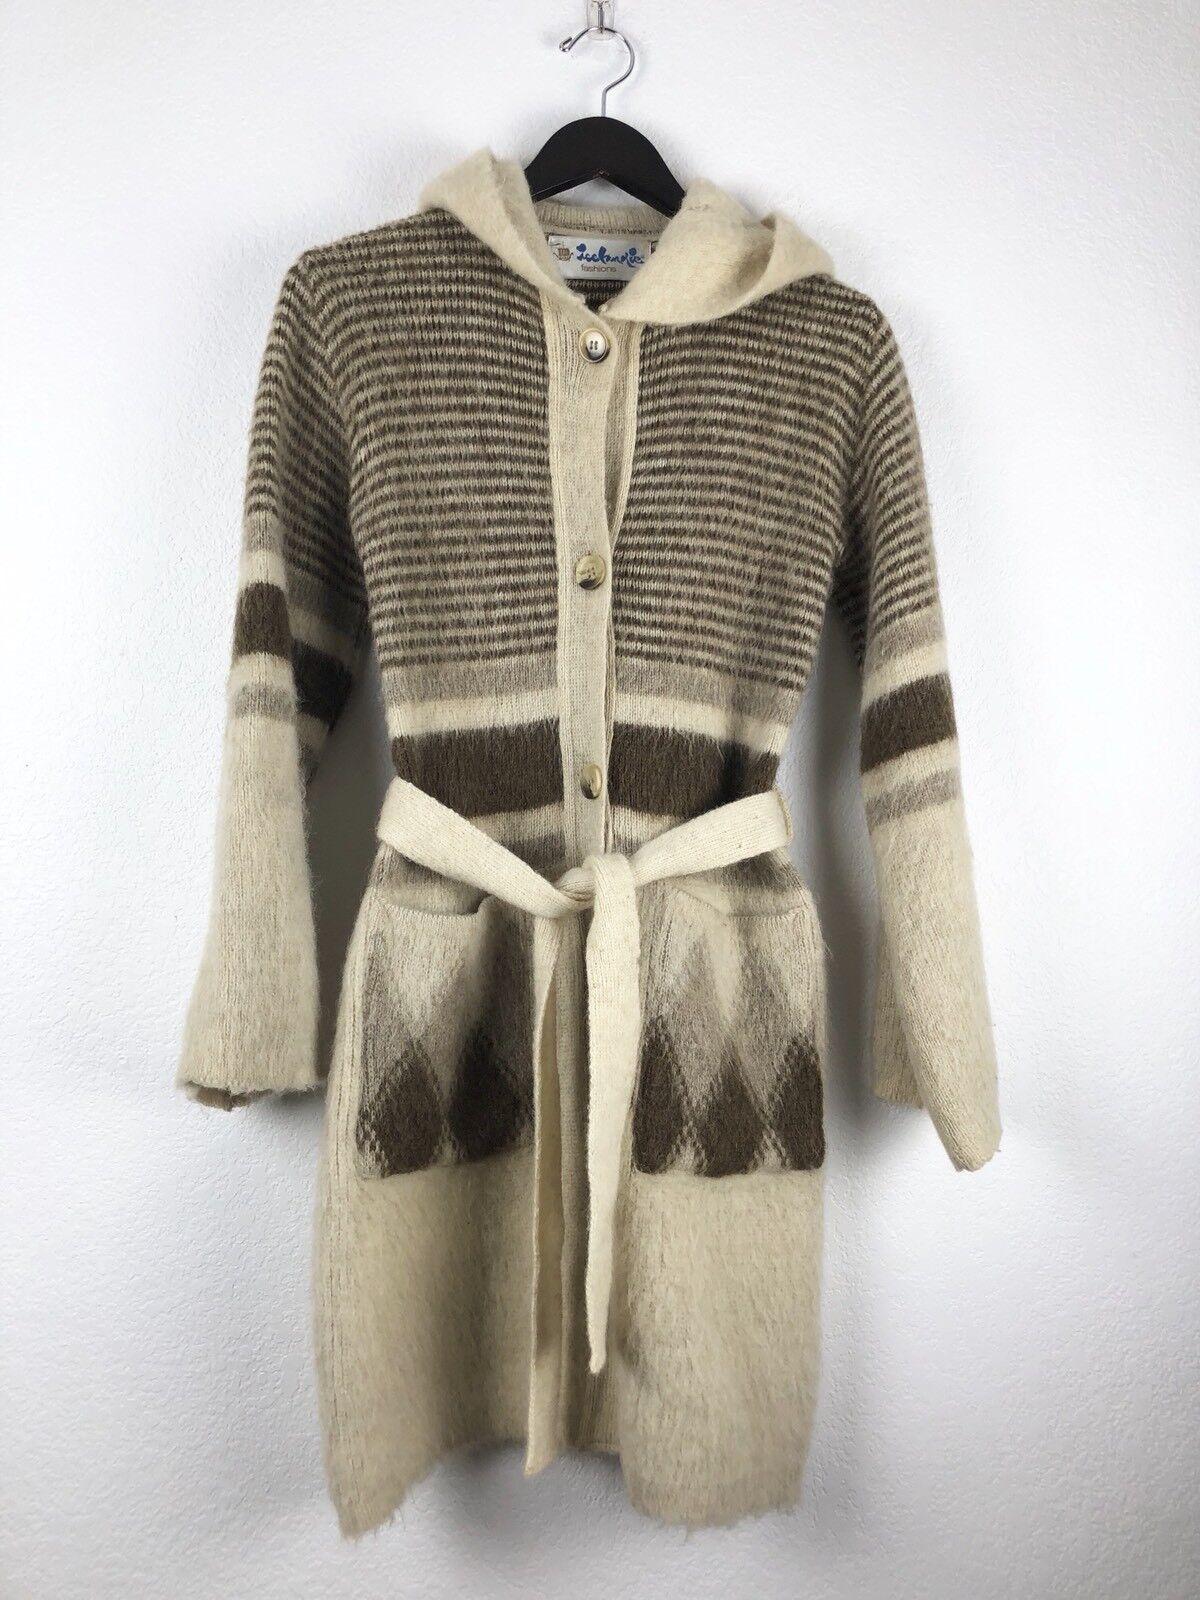 Vintage Icelandic Fashions Women's Sz Medium Arctic Wool Hooded Cardigan Sweater